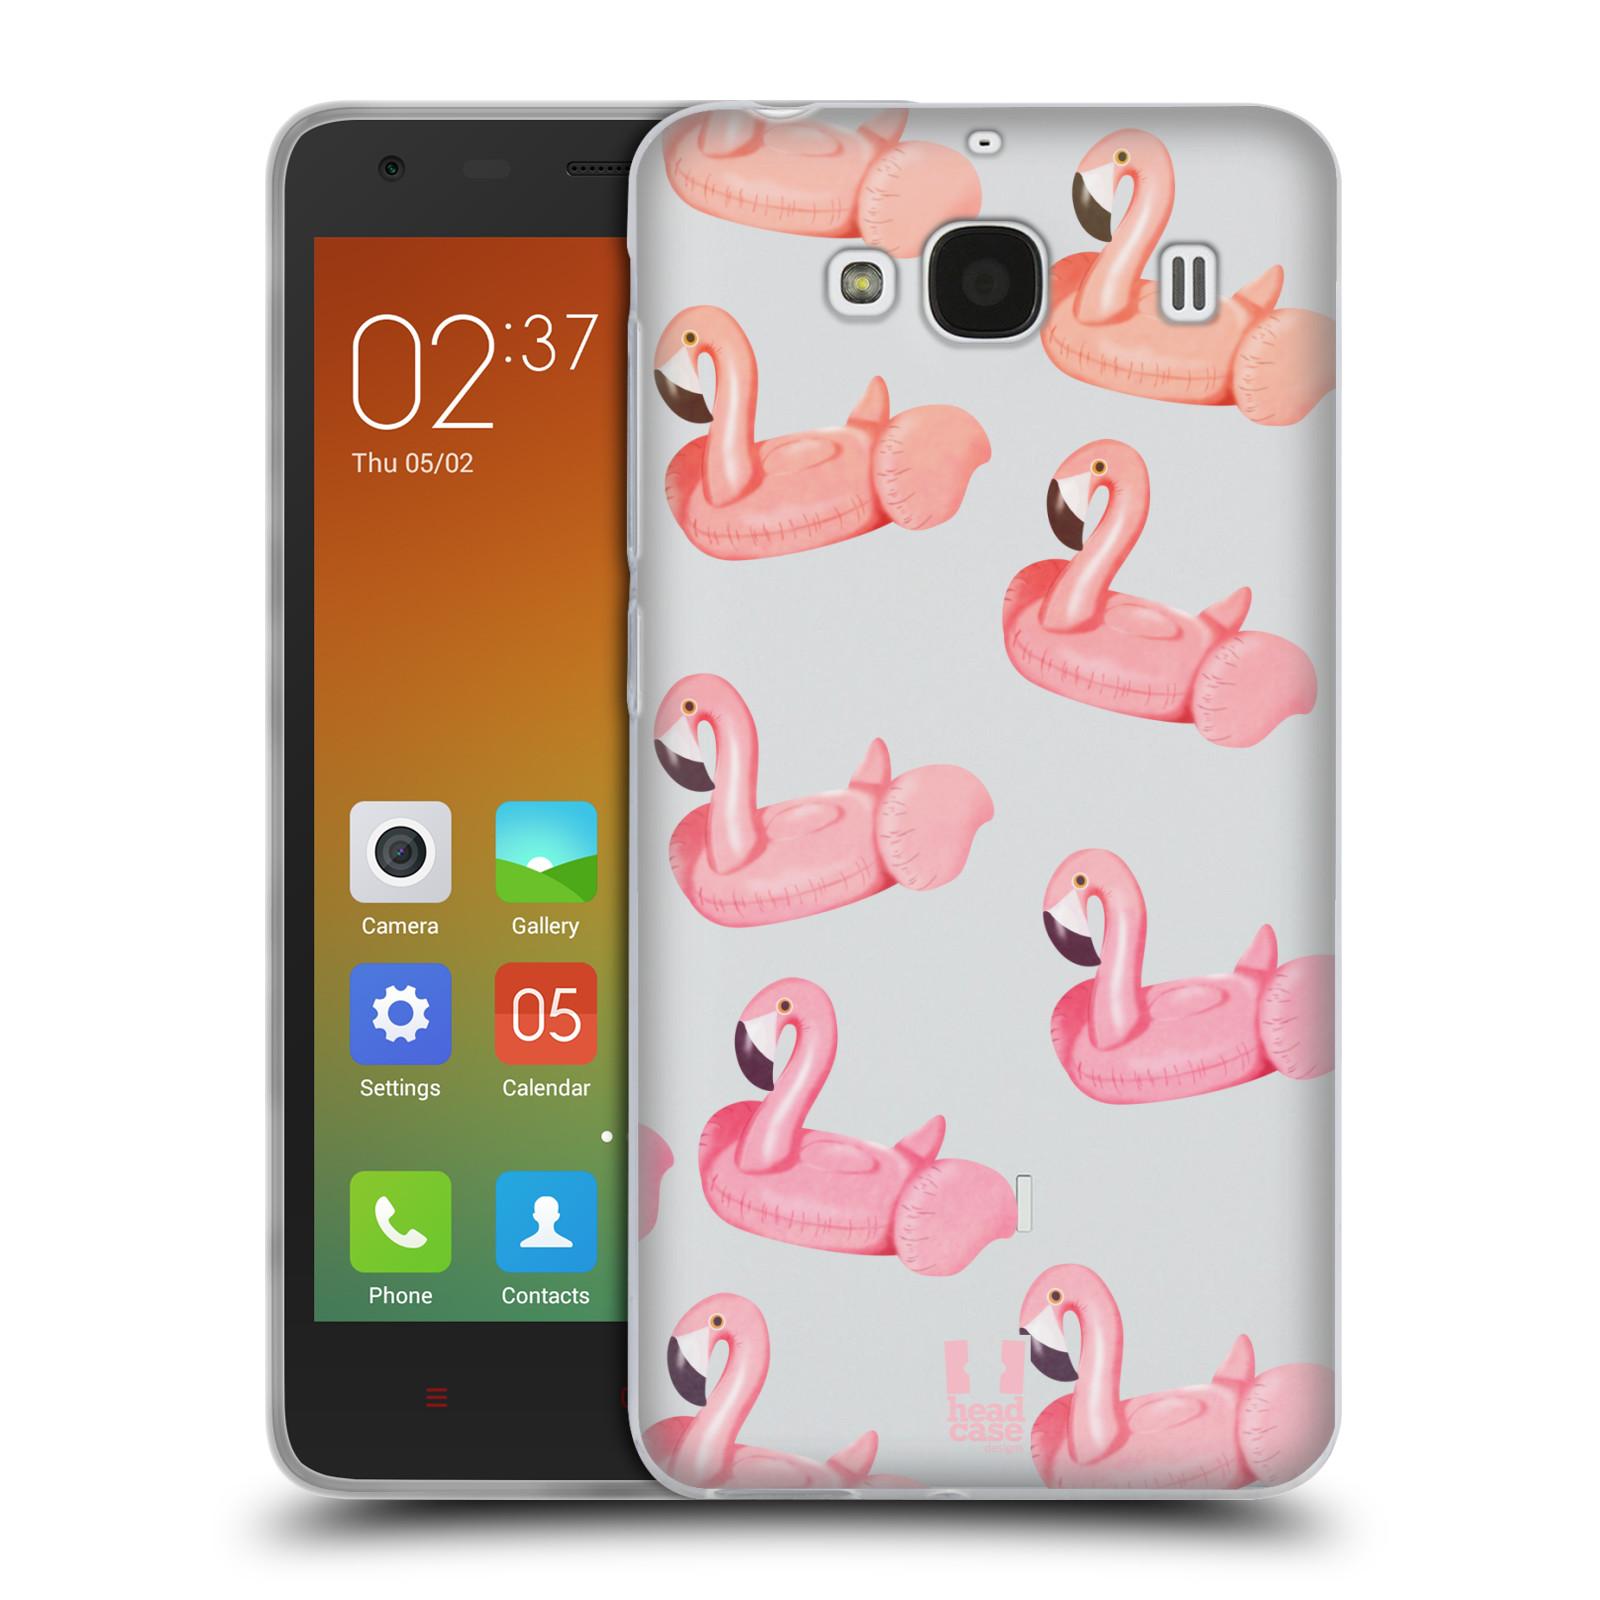 Silikonové pouzdro na mobil Xiaomi Redmi 2 - Head Case - Kruh plaměňák